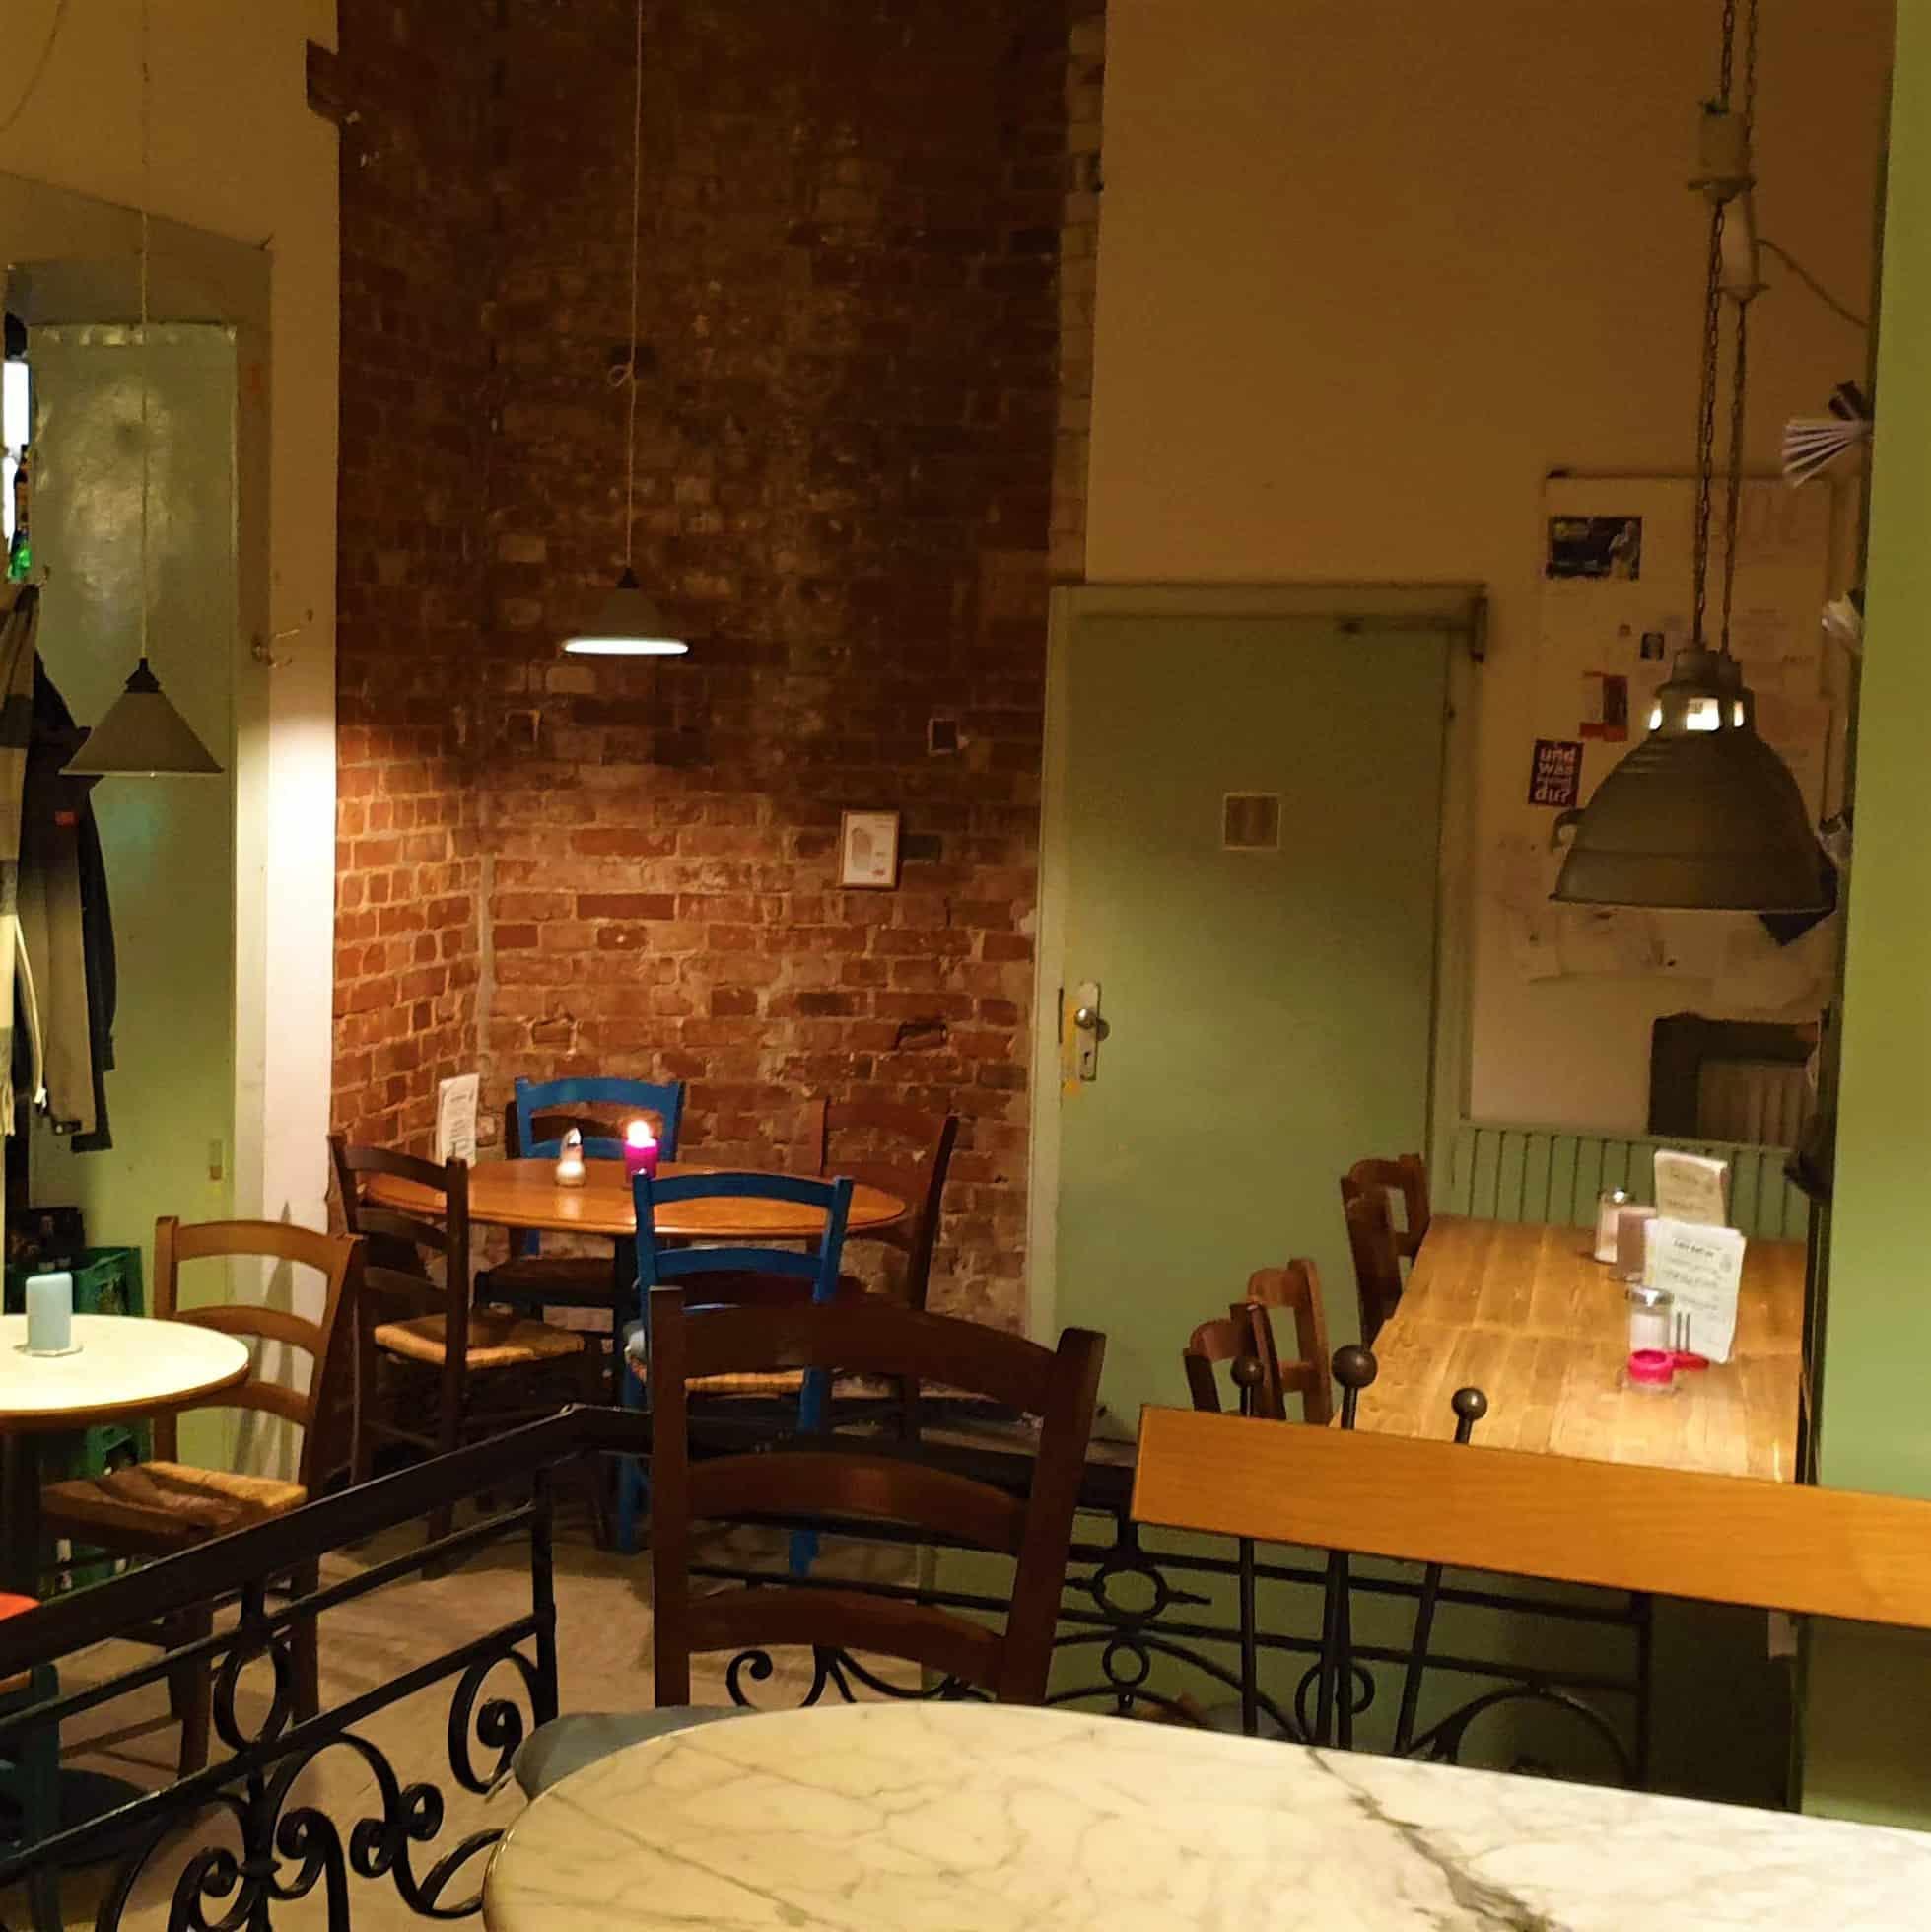 Style Hannover Cafe Safran 5 - Café Safran: Urgestein in Hannovers Gastronomie